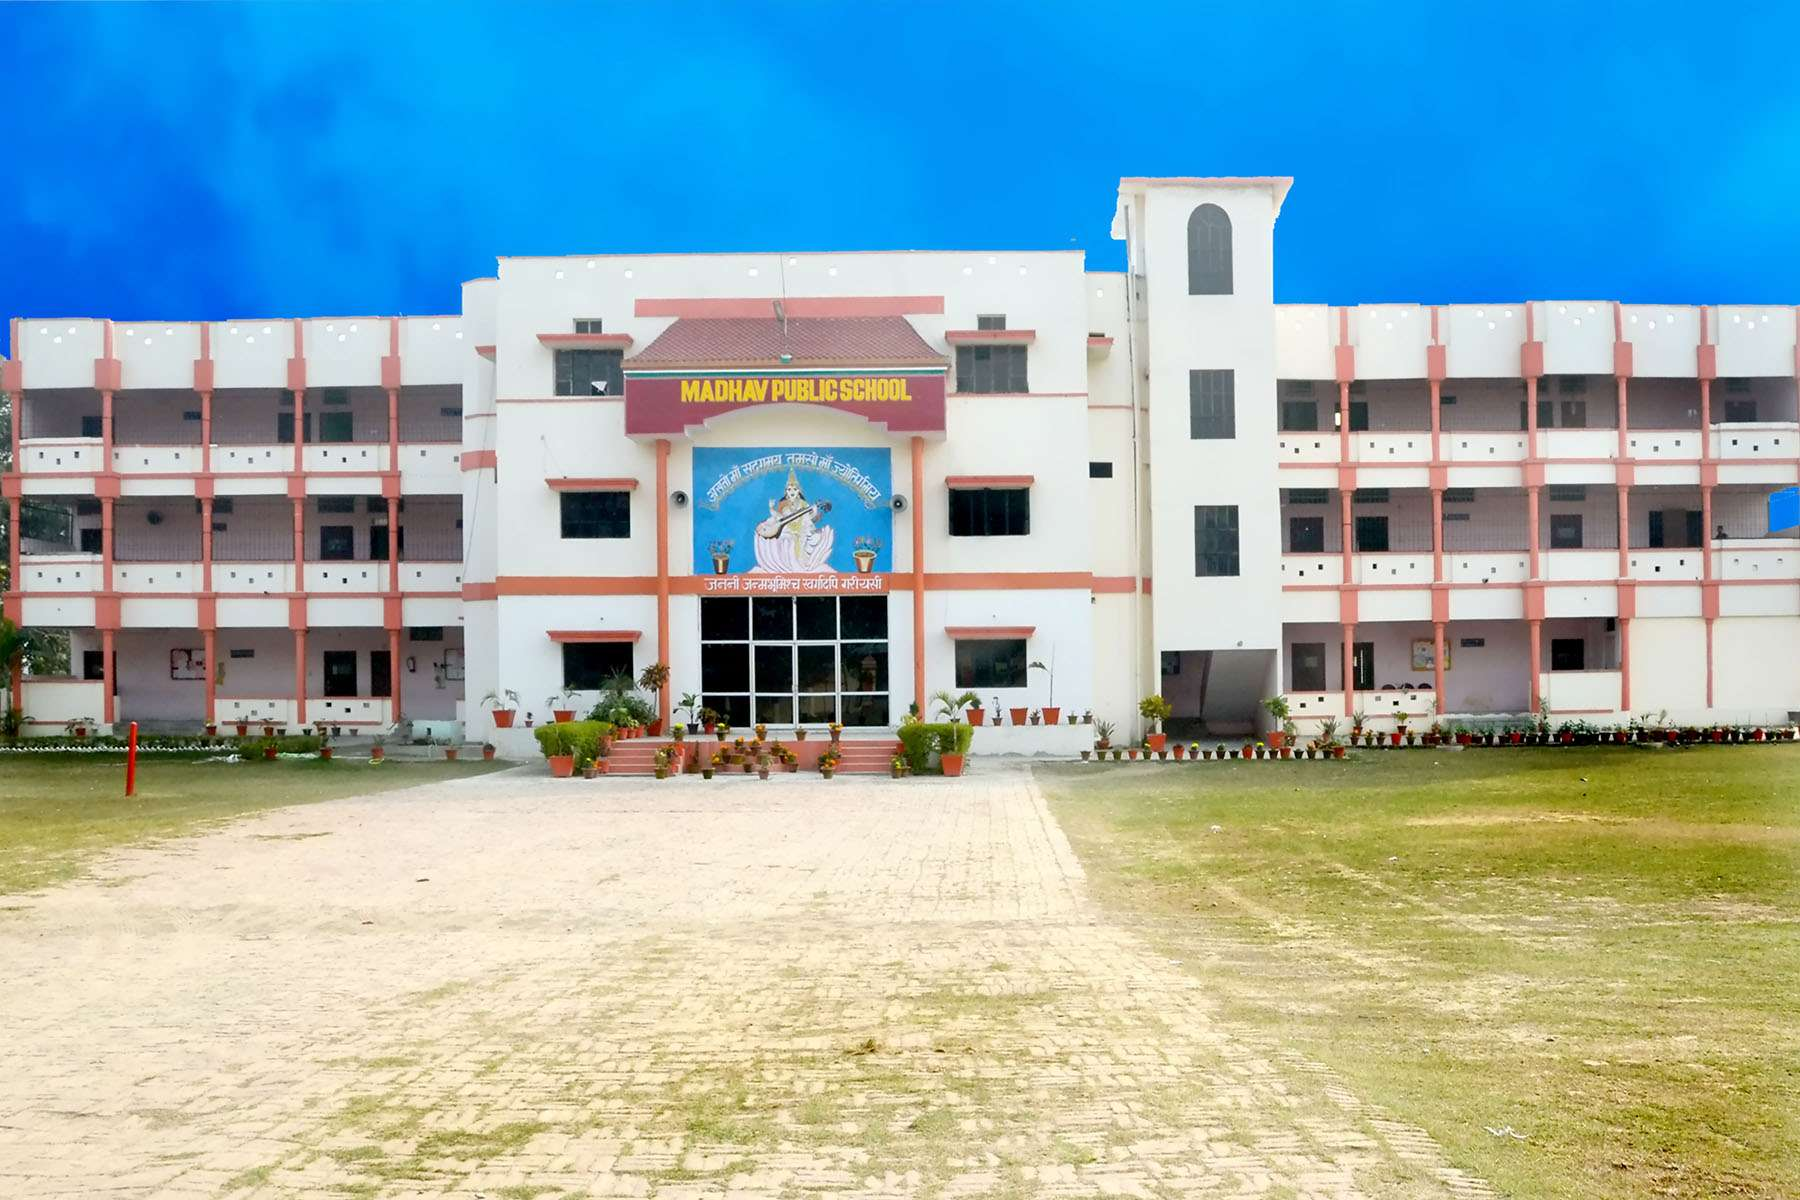 Madhav Public School Benua Tikar Dawar Par Gorakhpur 2131450